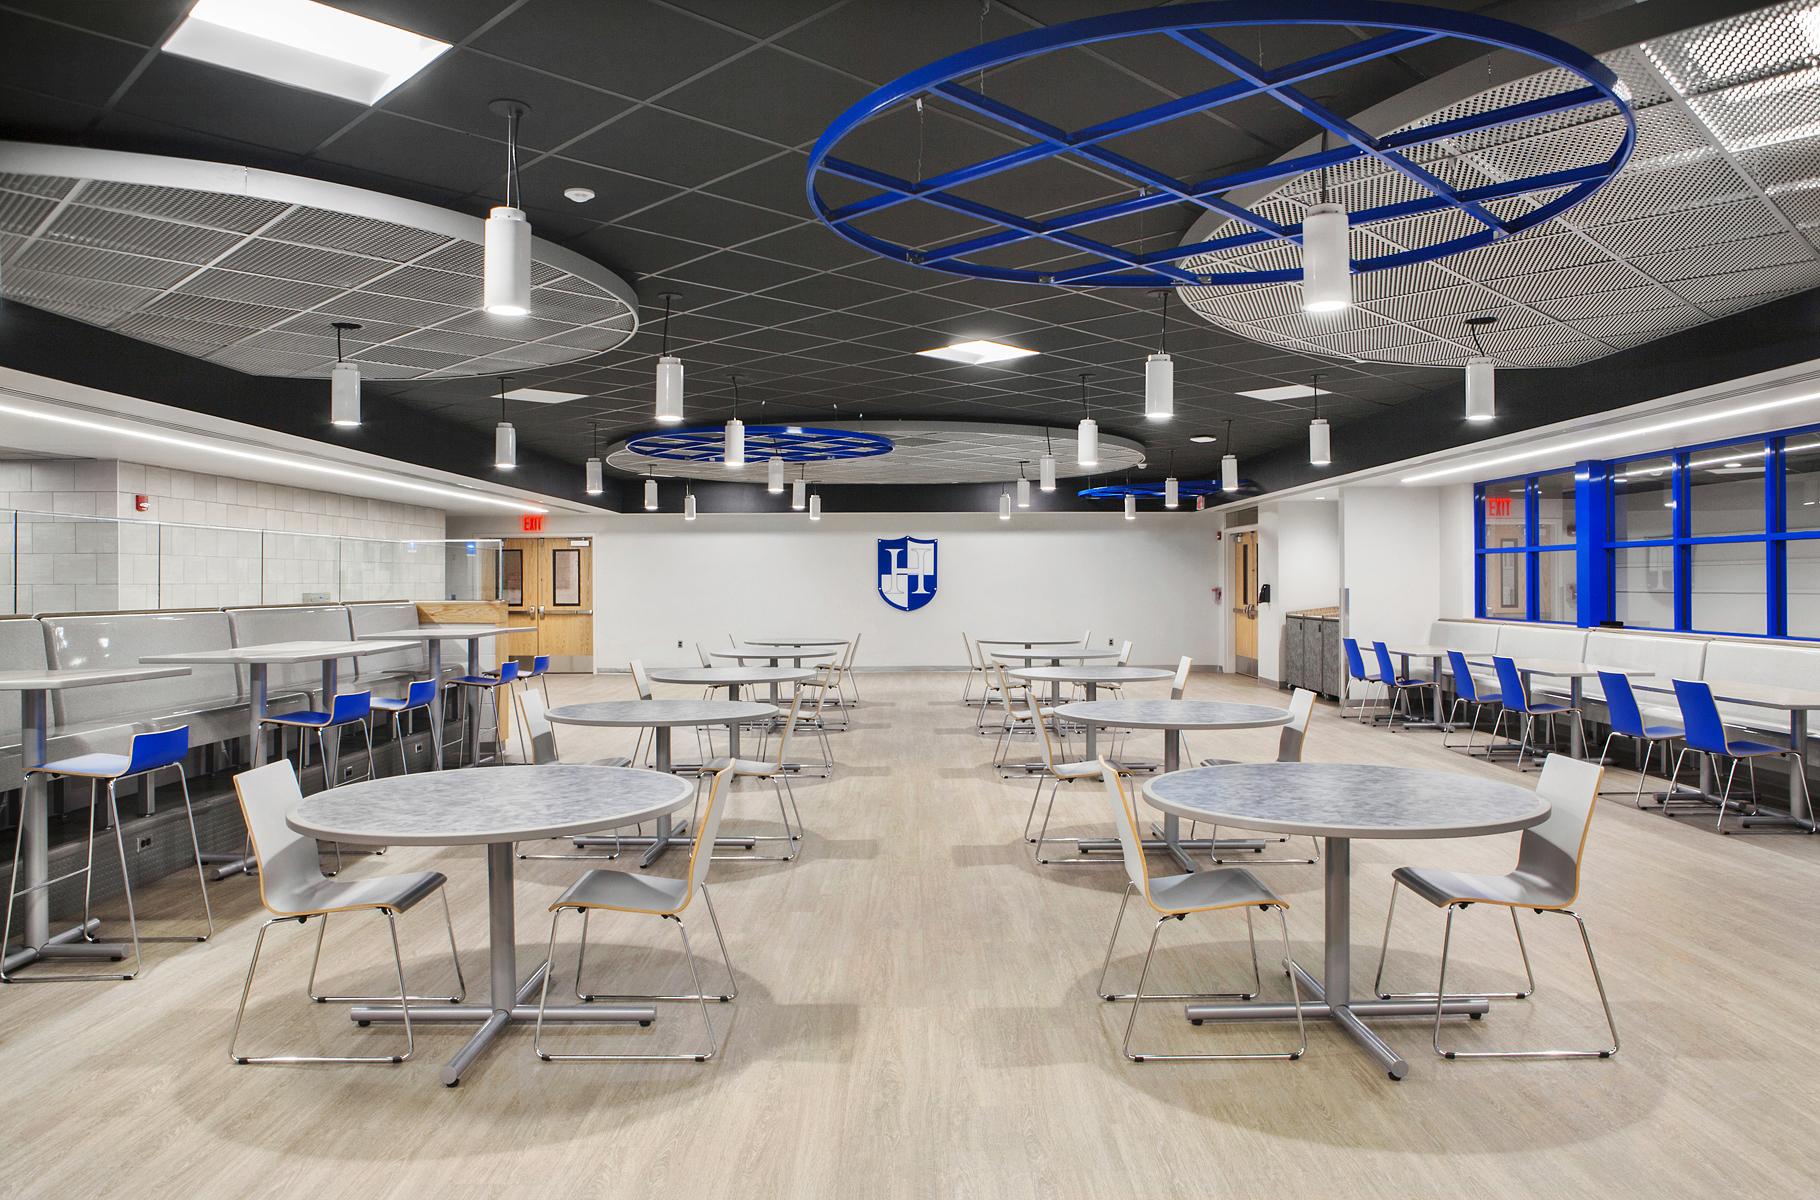 Shiffler Lighting Solution Cafeteria LED Lighting Solution